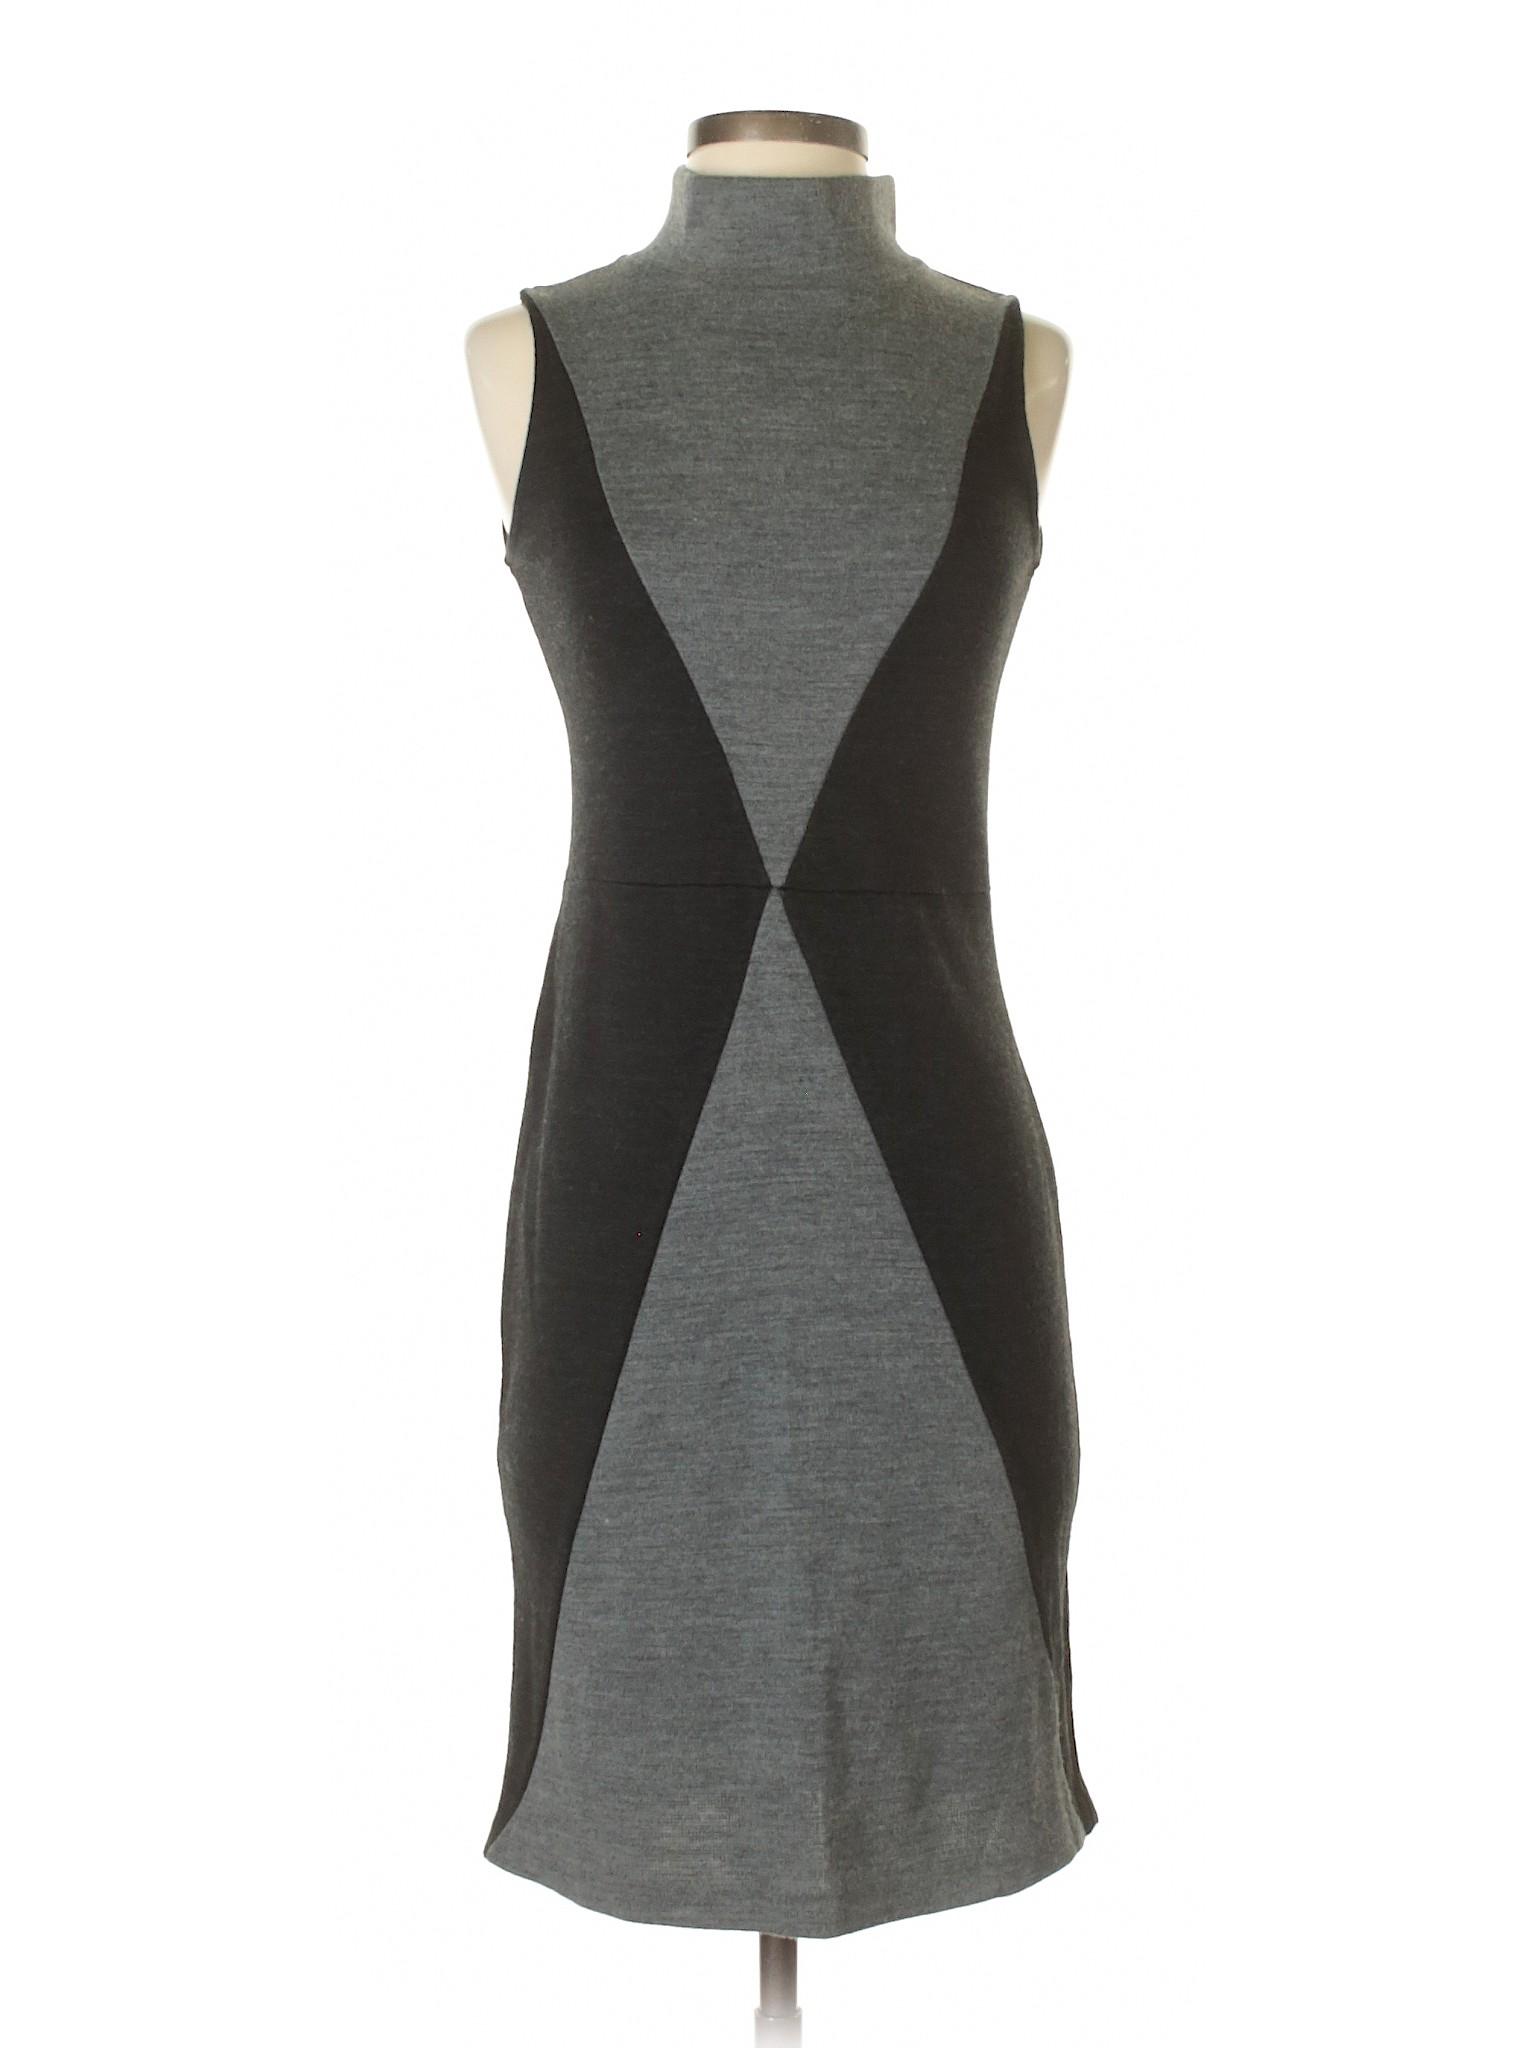 Boutique Dress winter Boutique winter Casual Glam Boutique winter Glam Glam Dress Casual Rn4Tq056